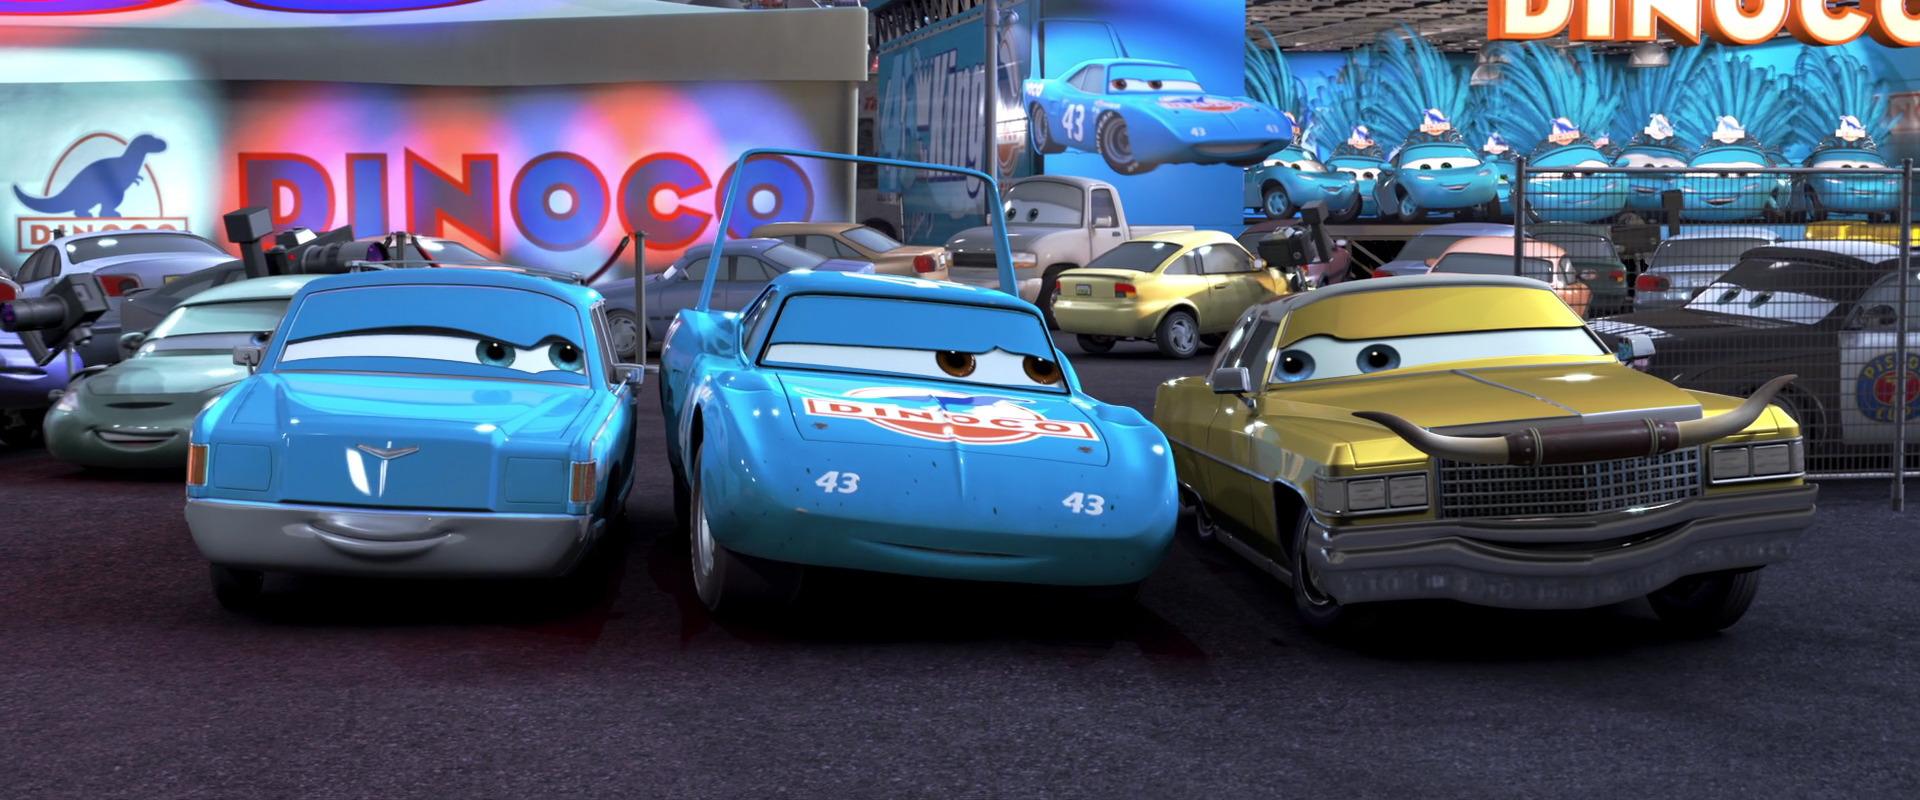 Disney Pixar Cars Pickup Version Lightning McQueen With Headset And Scarce Version Dinoco Pickup